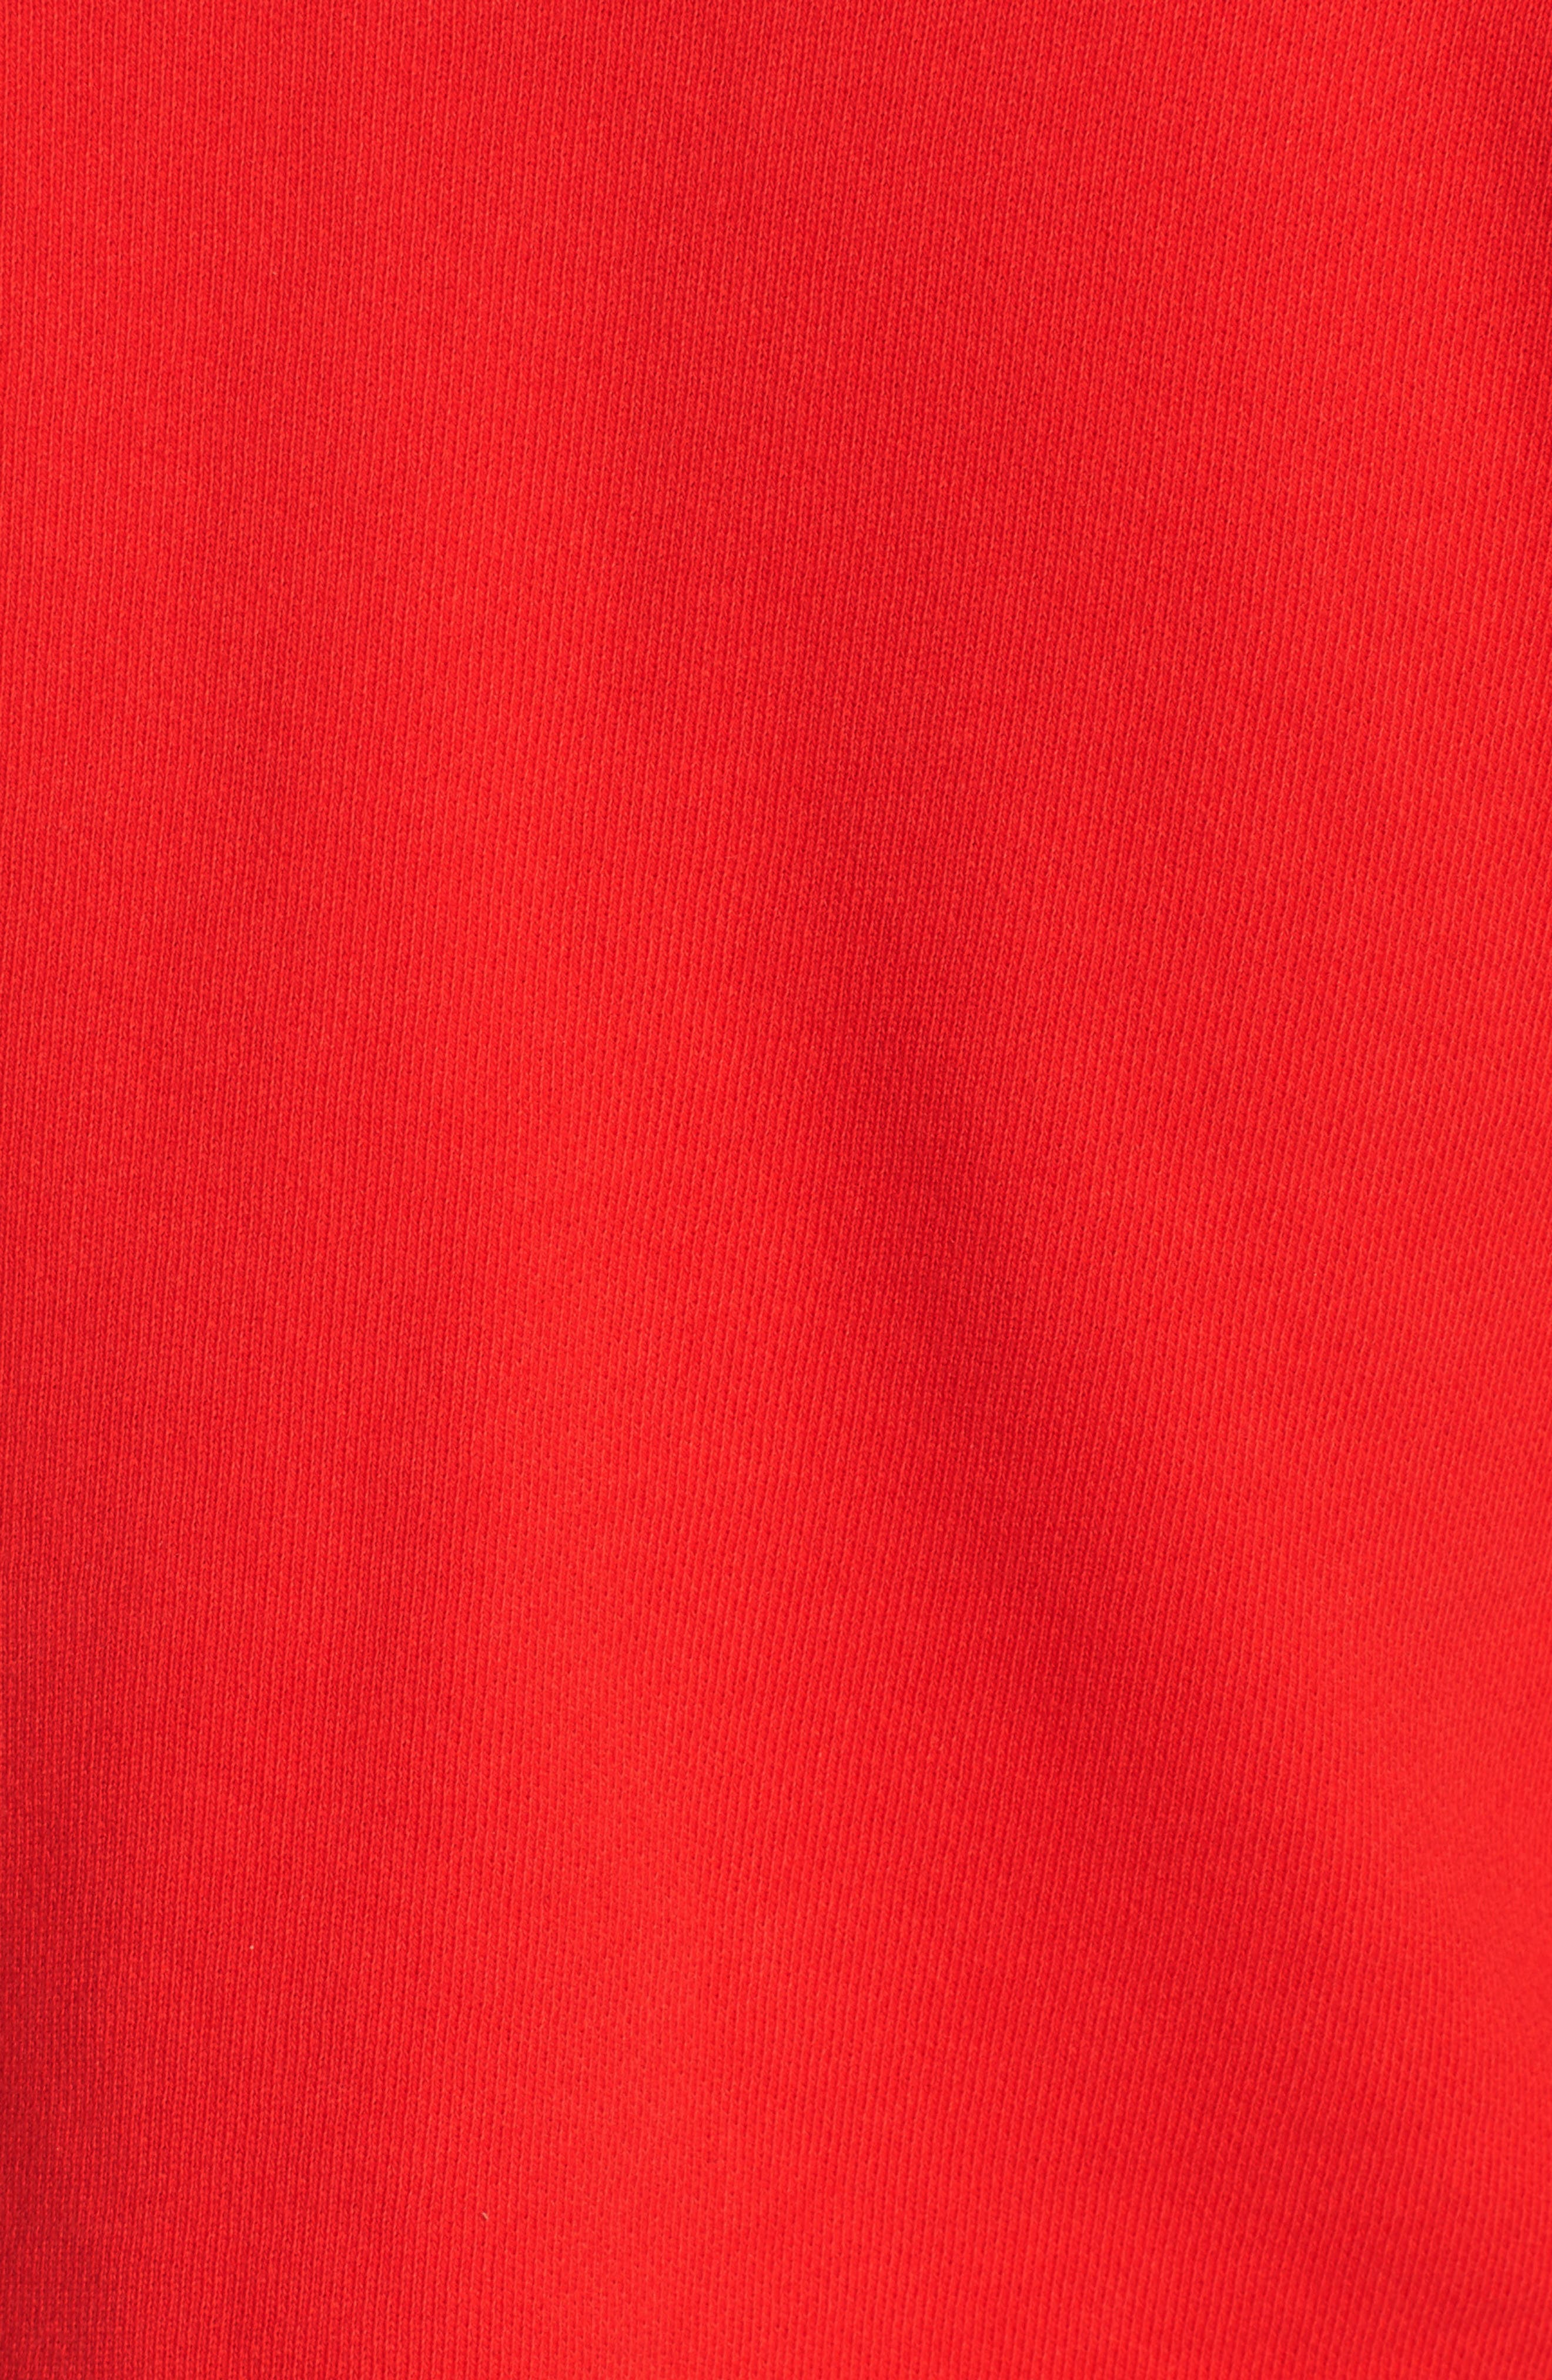 Flare Sleeve Crop Sweatshirt,                             Alternate thumbnail 5, color,